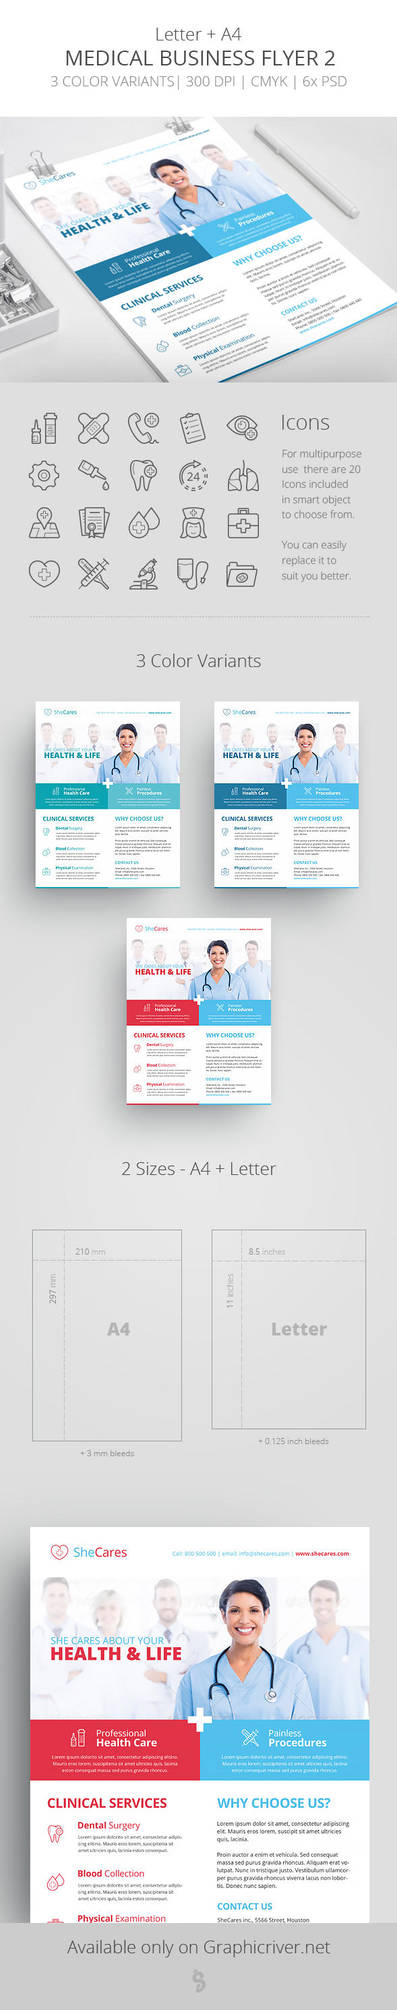 Medical Business Flyer Template 2 by survivorcz